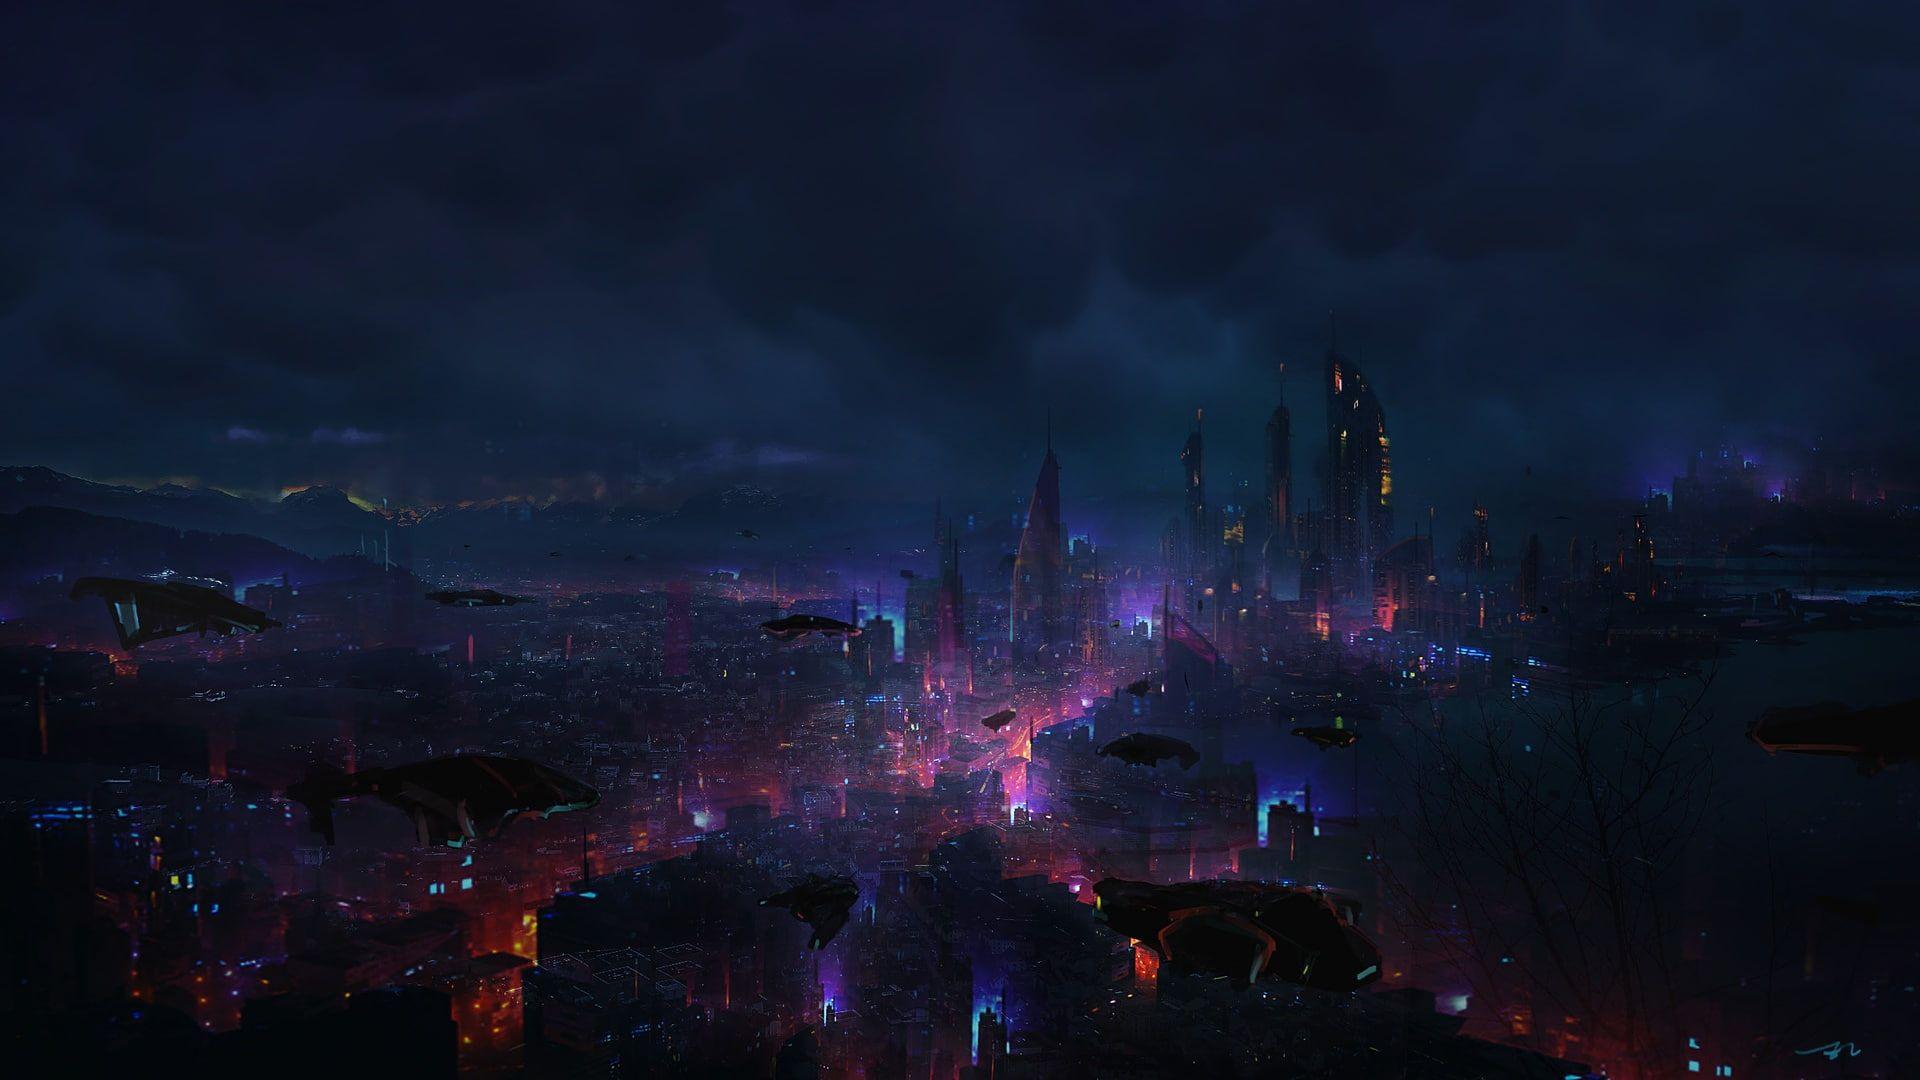 Dark Futuristic City Digital Art Science Fiction Eric Lee 1080p Wallpaper Hdwallp Cyberpunk 2077 Night City Wallpaper City Wallpaper Cyberpunk Wallpaper 4k